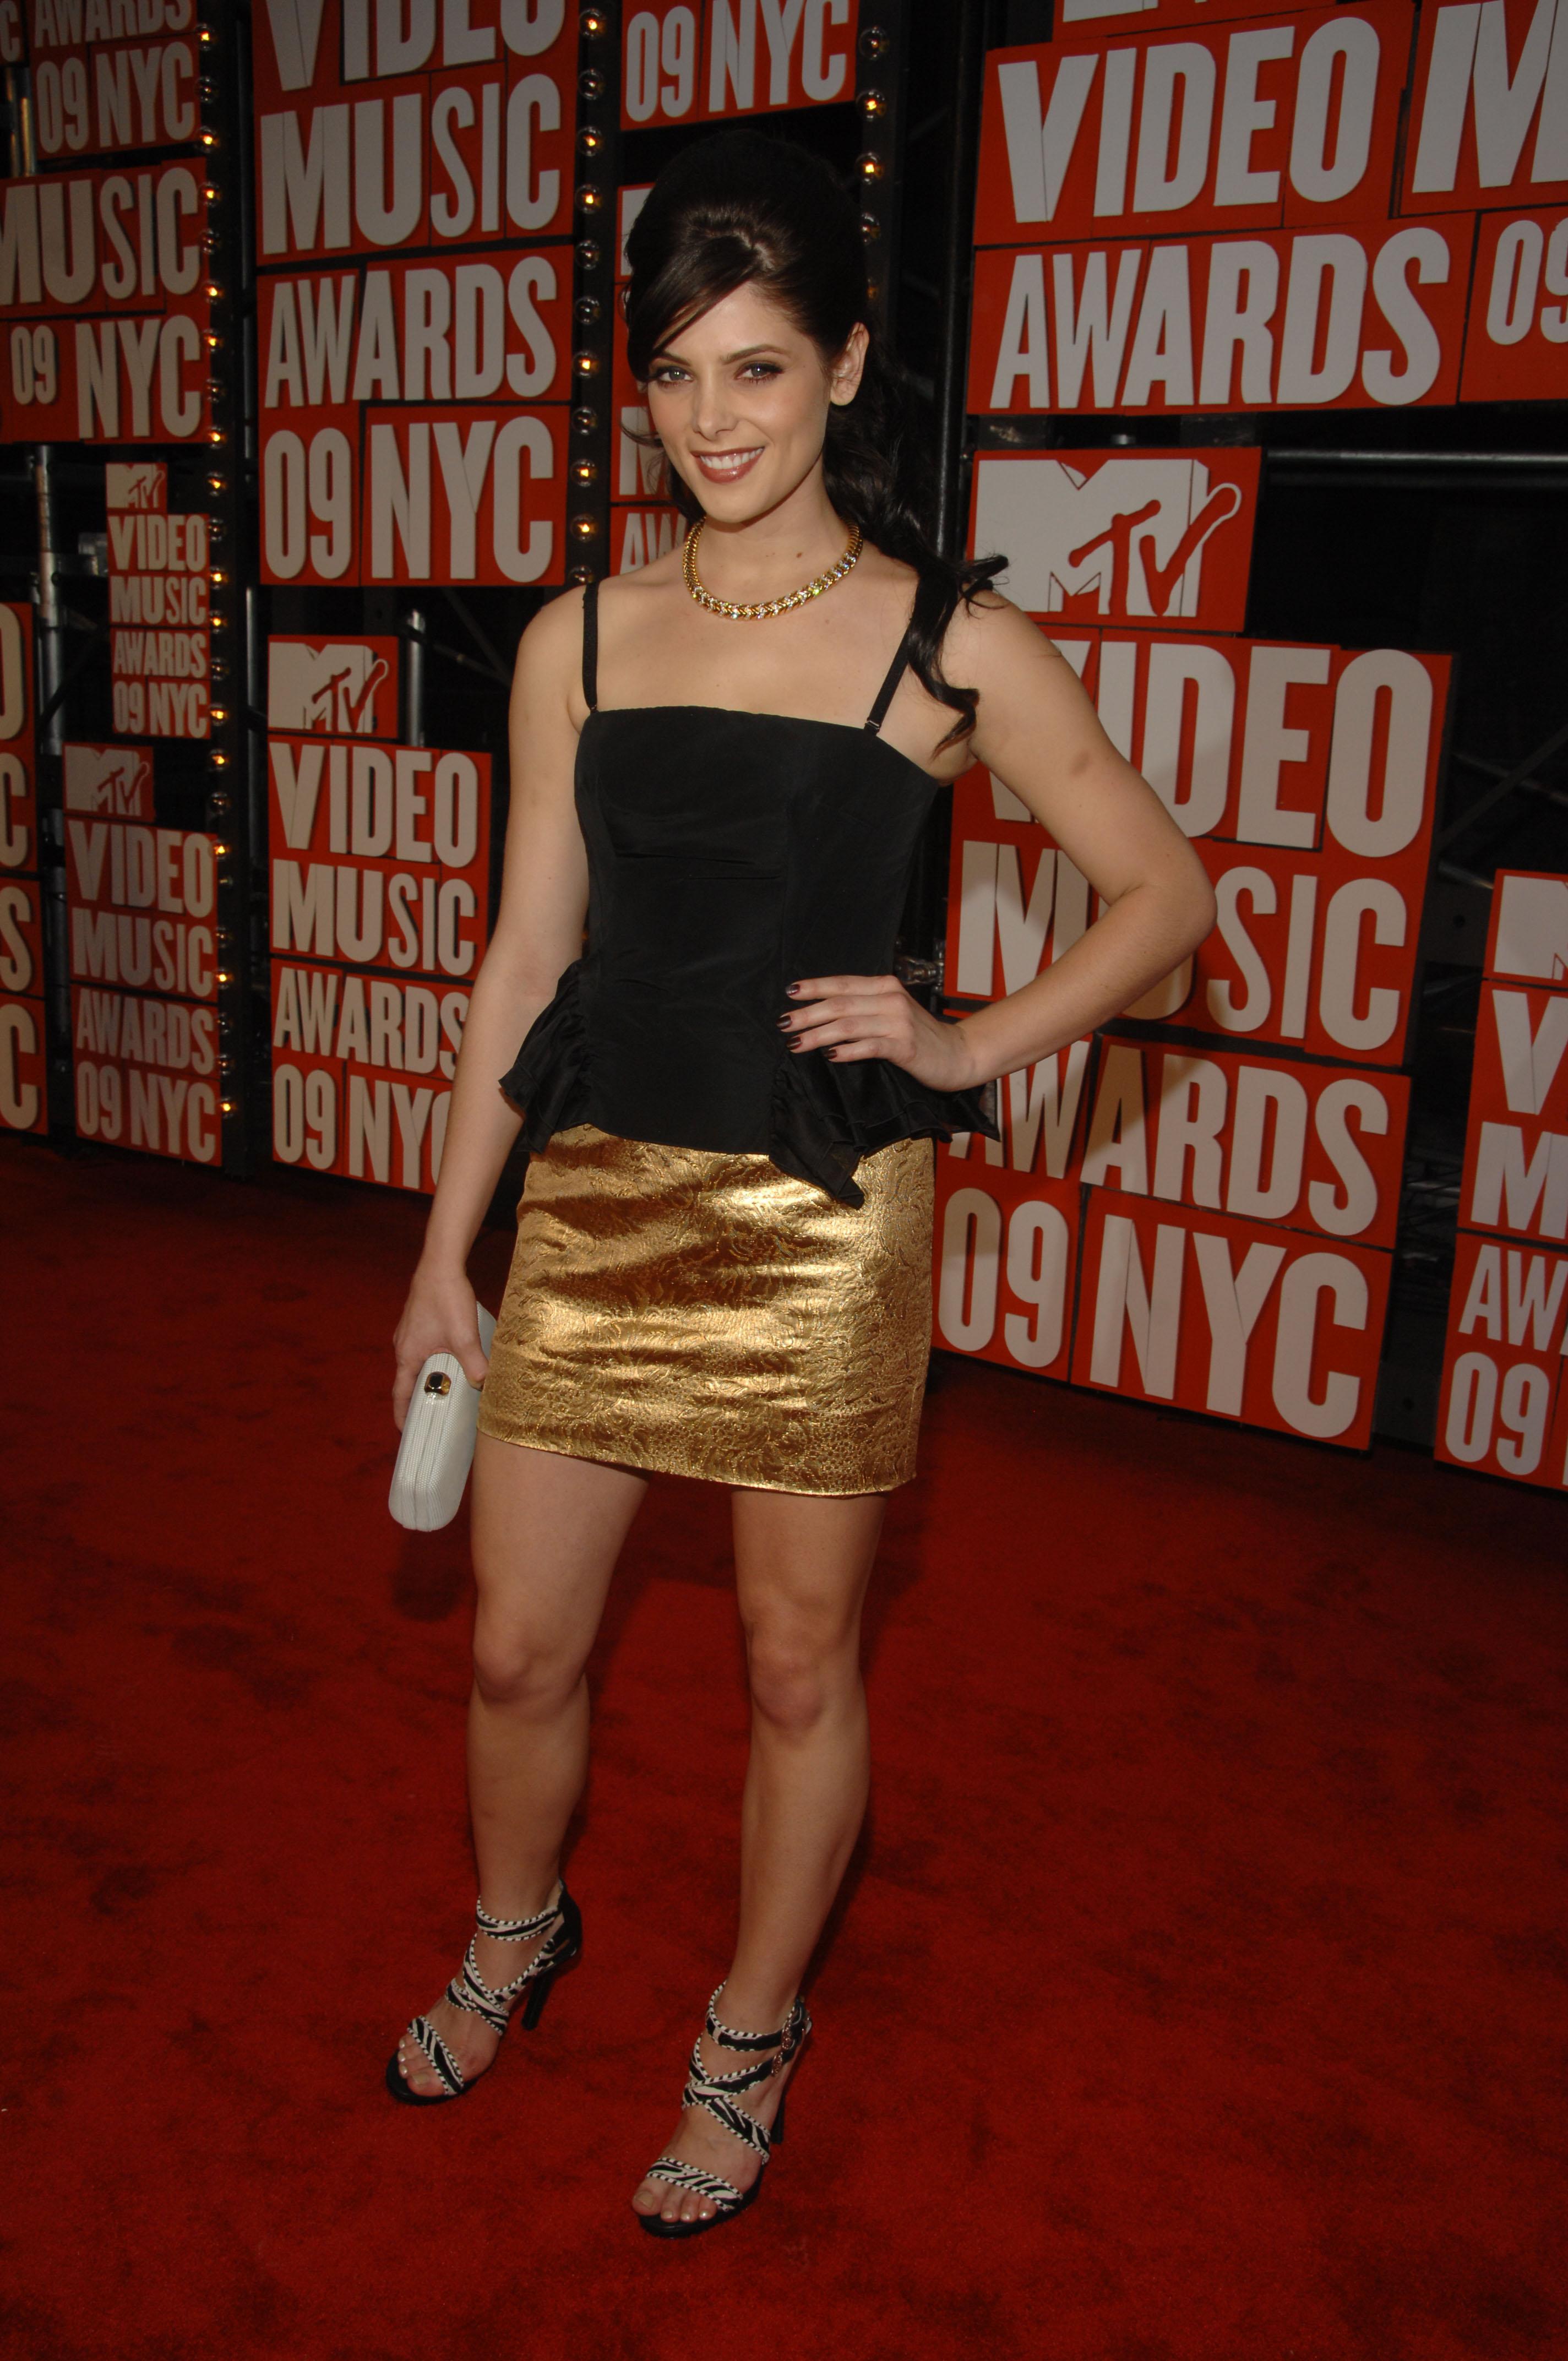 86534_celebrity-paradise.com-The_Elder-Ashley_Greene_2009-09-13_-_MTV_Video_Music_Awards_2009_122_374lo.jpg